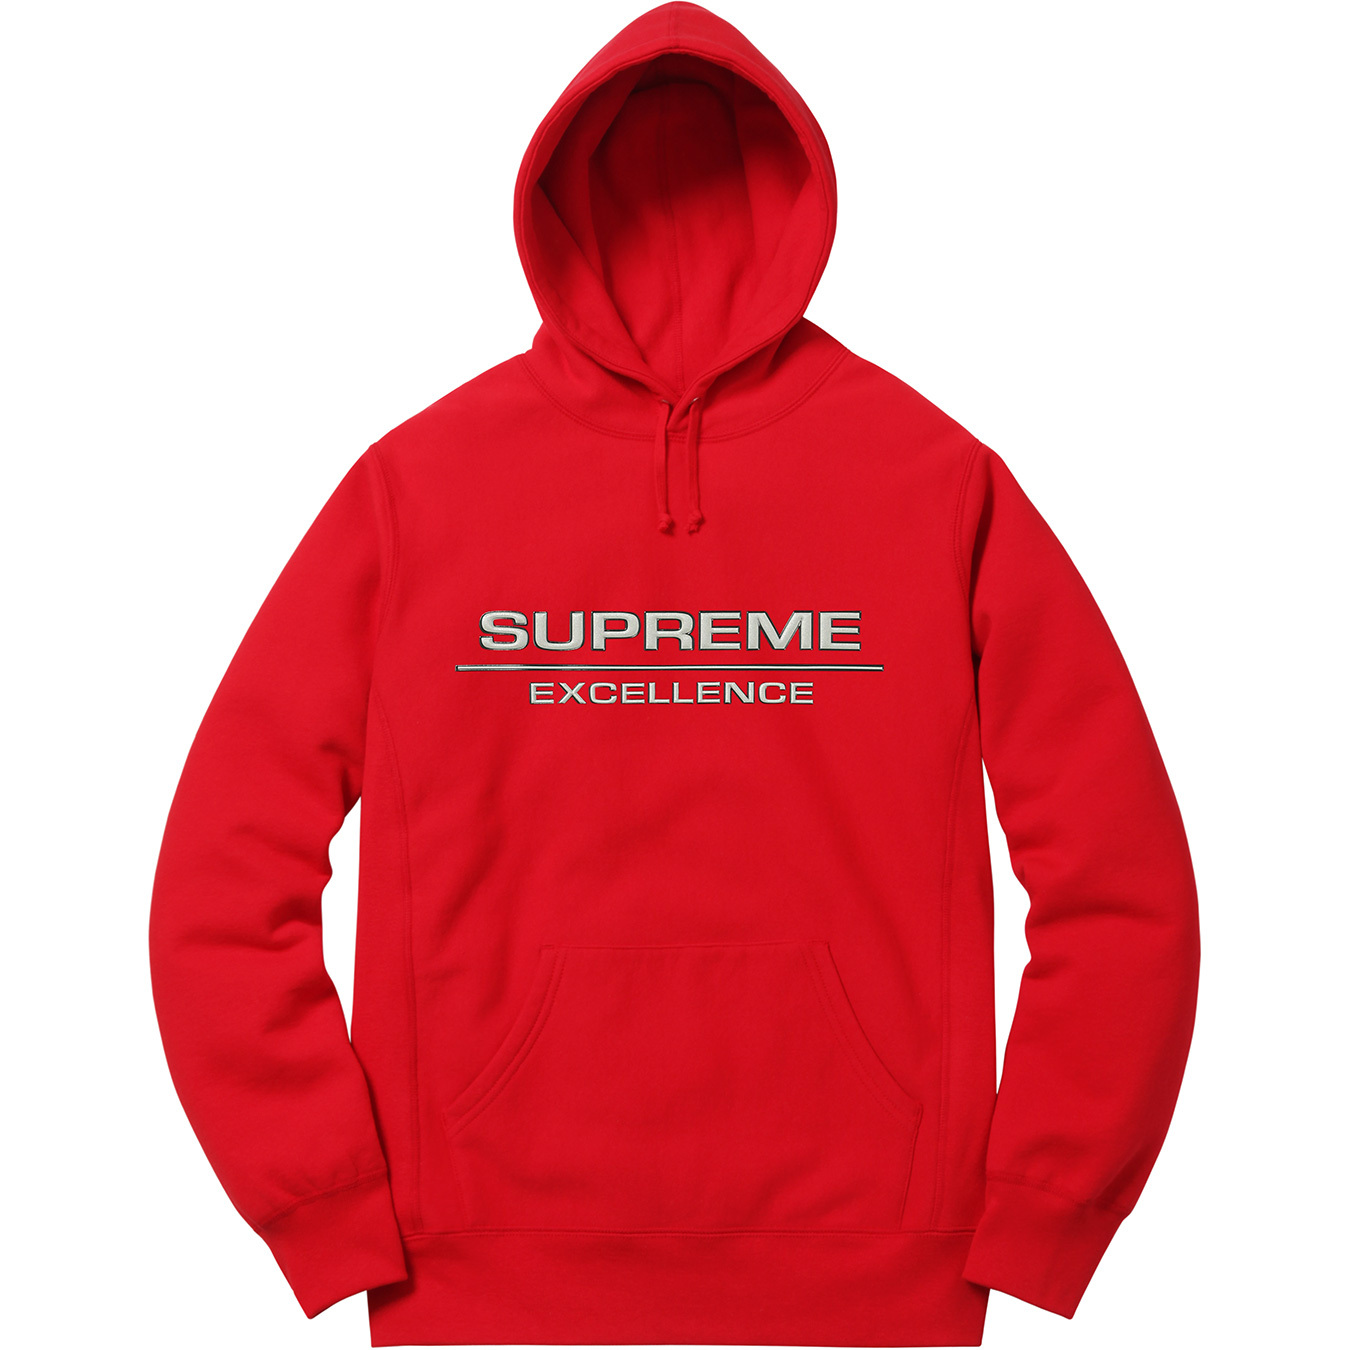 Details Supreme Reflective Excellence Hooded Sweatshirt Supreme Community [ 1350 x 1350 Pixel ]